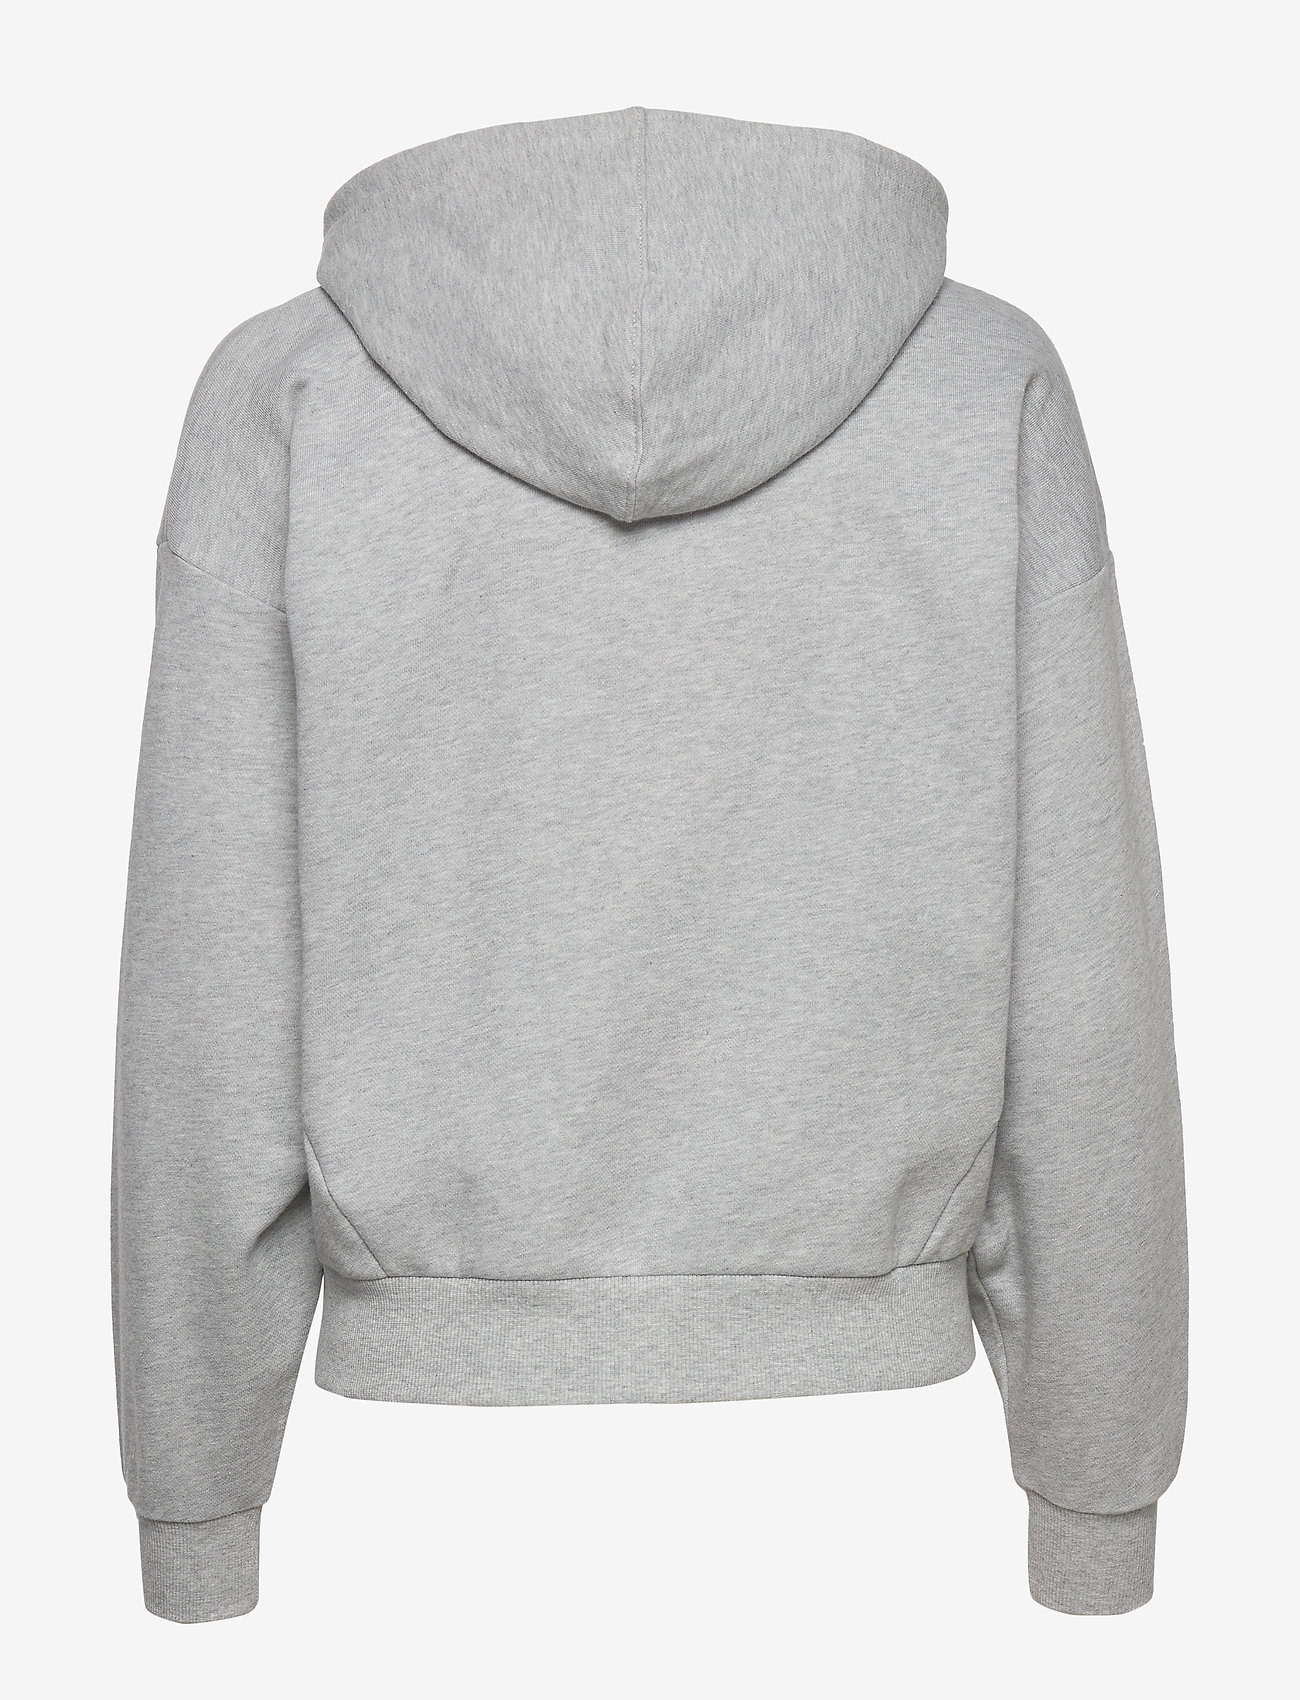 Tommy Sport - HOODY PIPING - hoodies - grey heather - 1